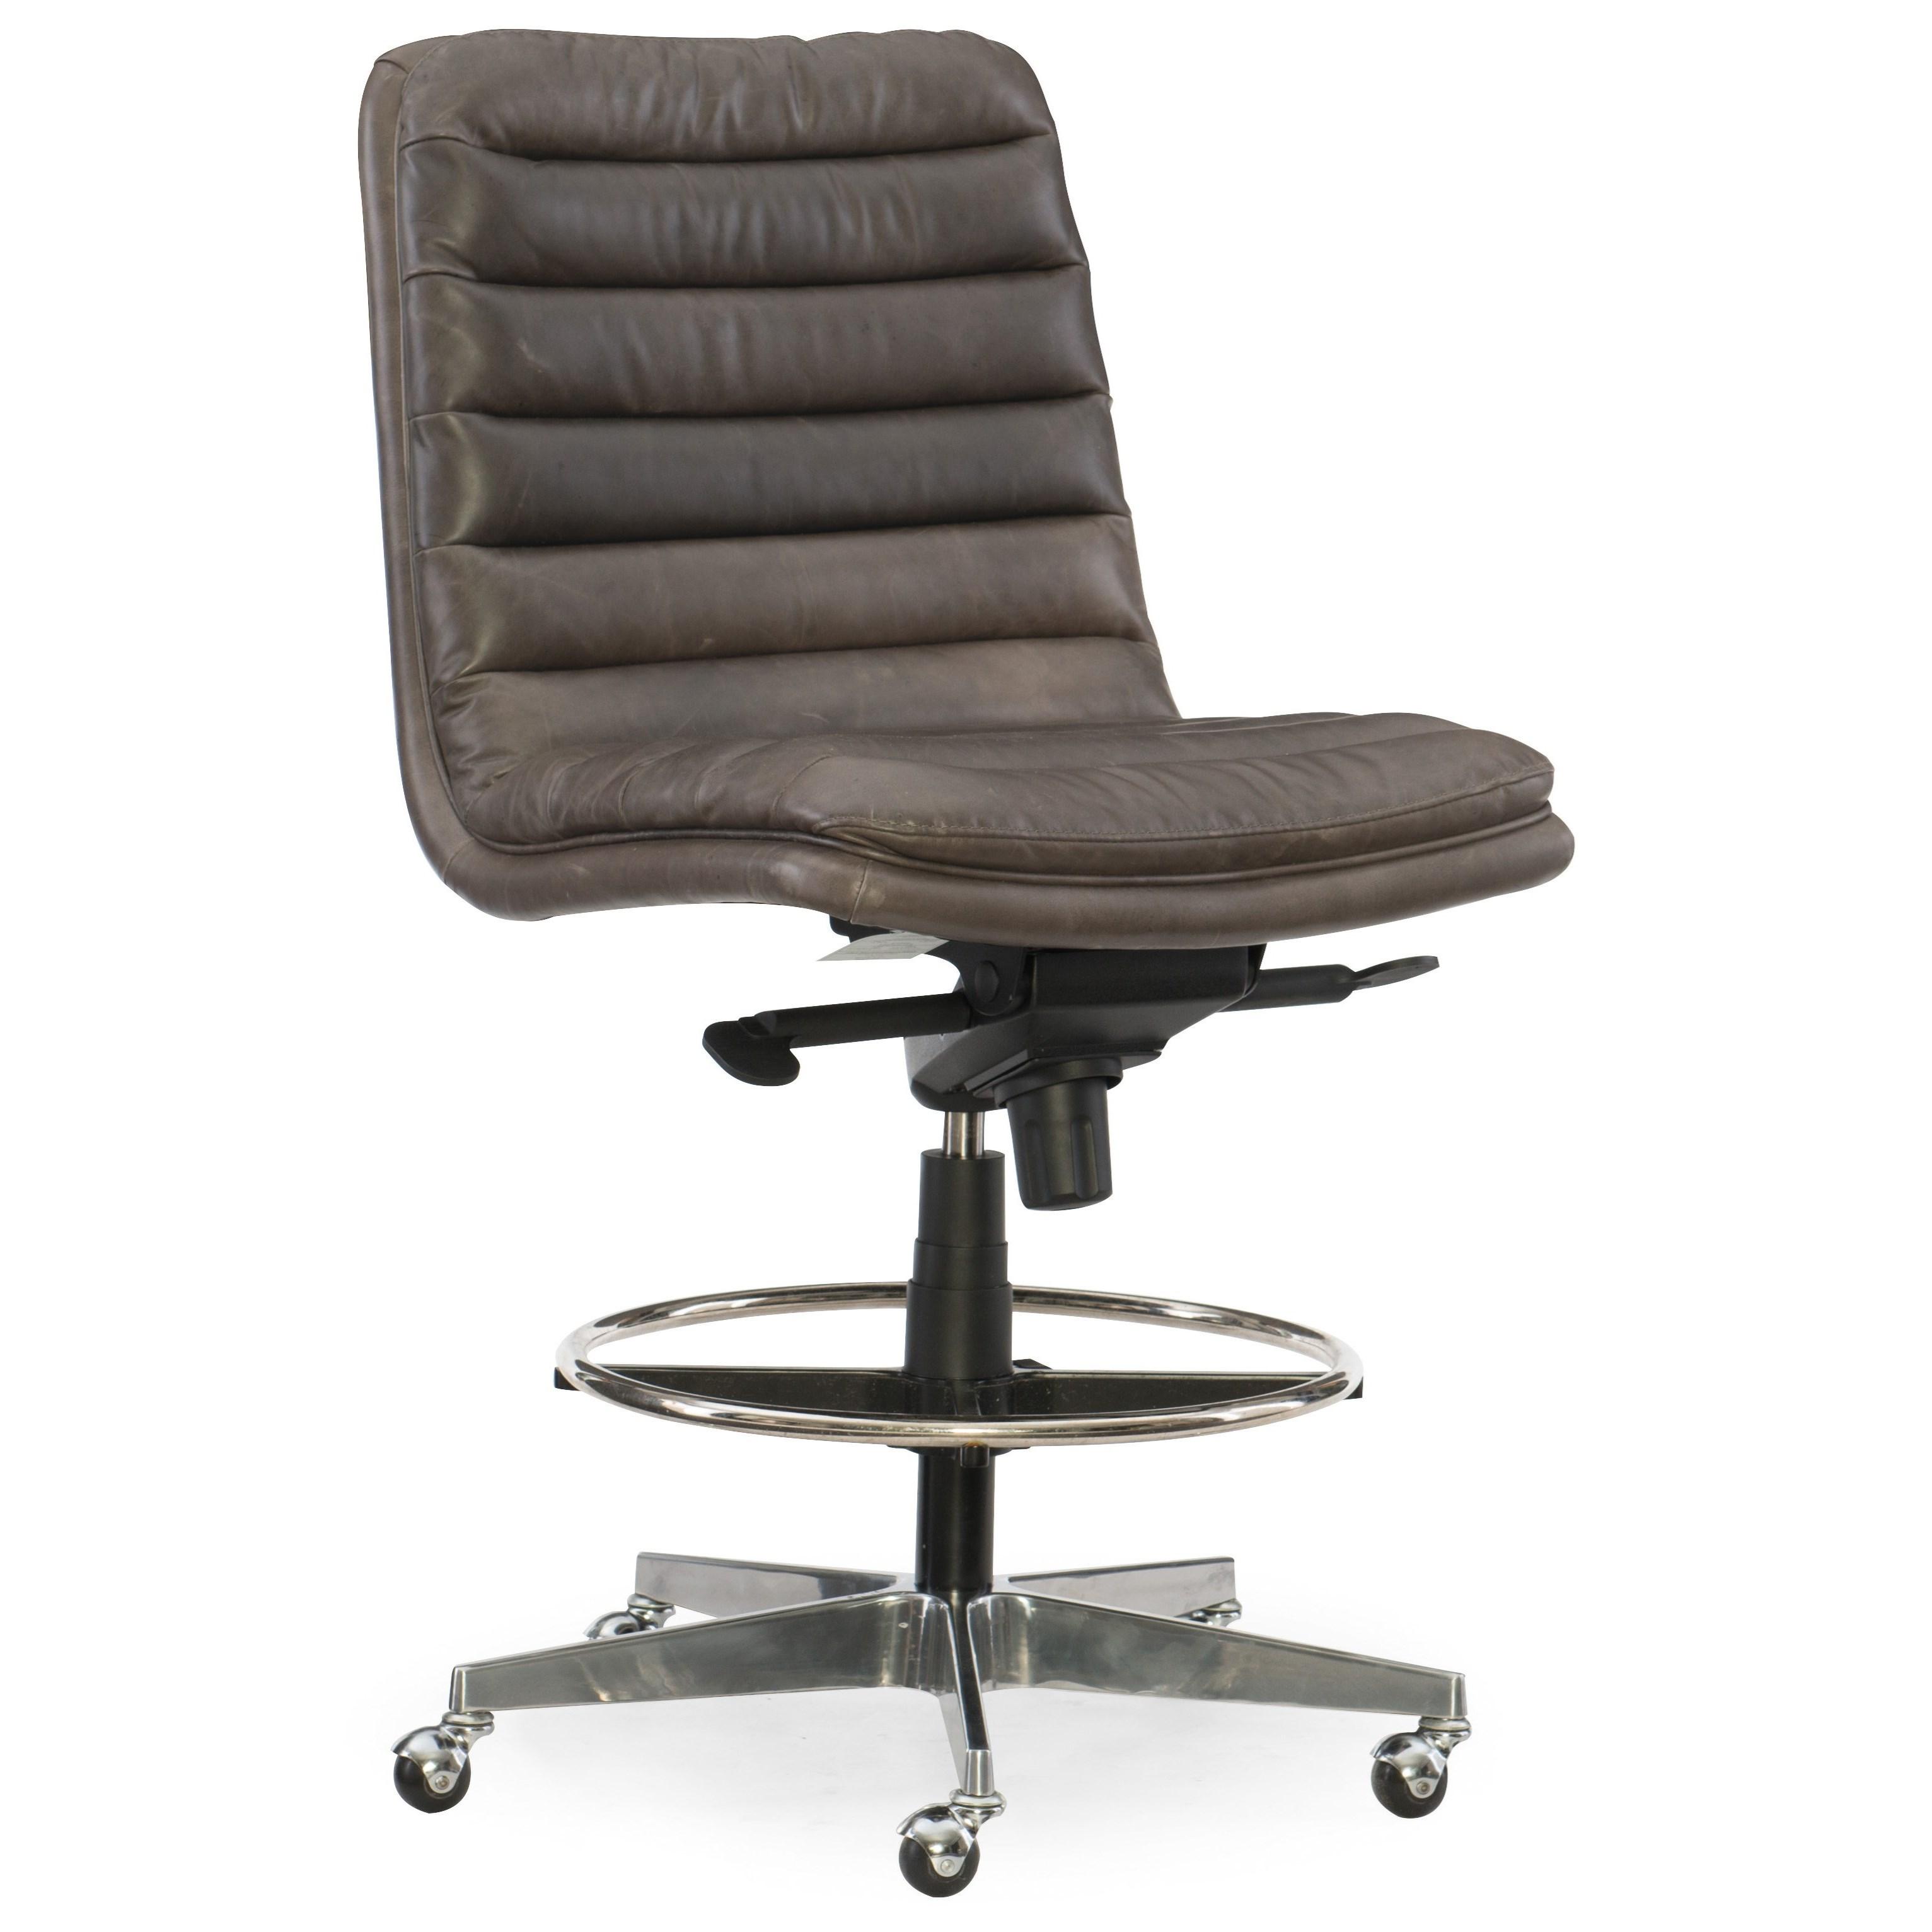 Hooker Furniture Executive Seating Wyatt Home Office Tall Desk Chair